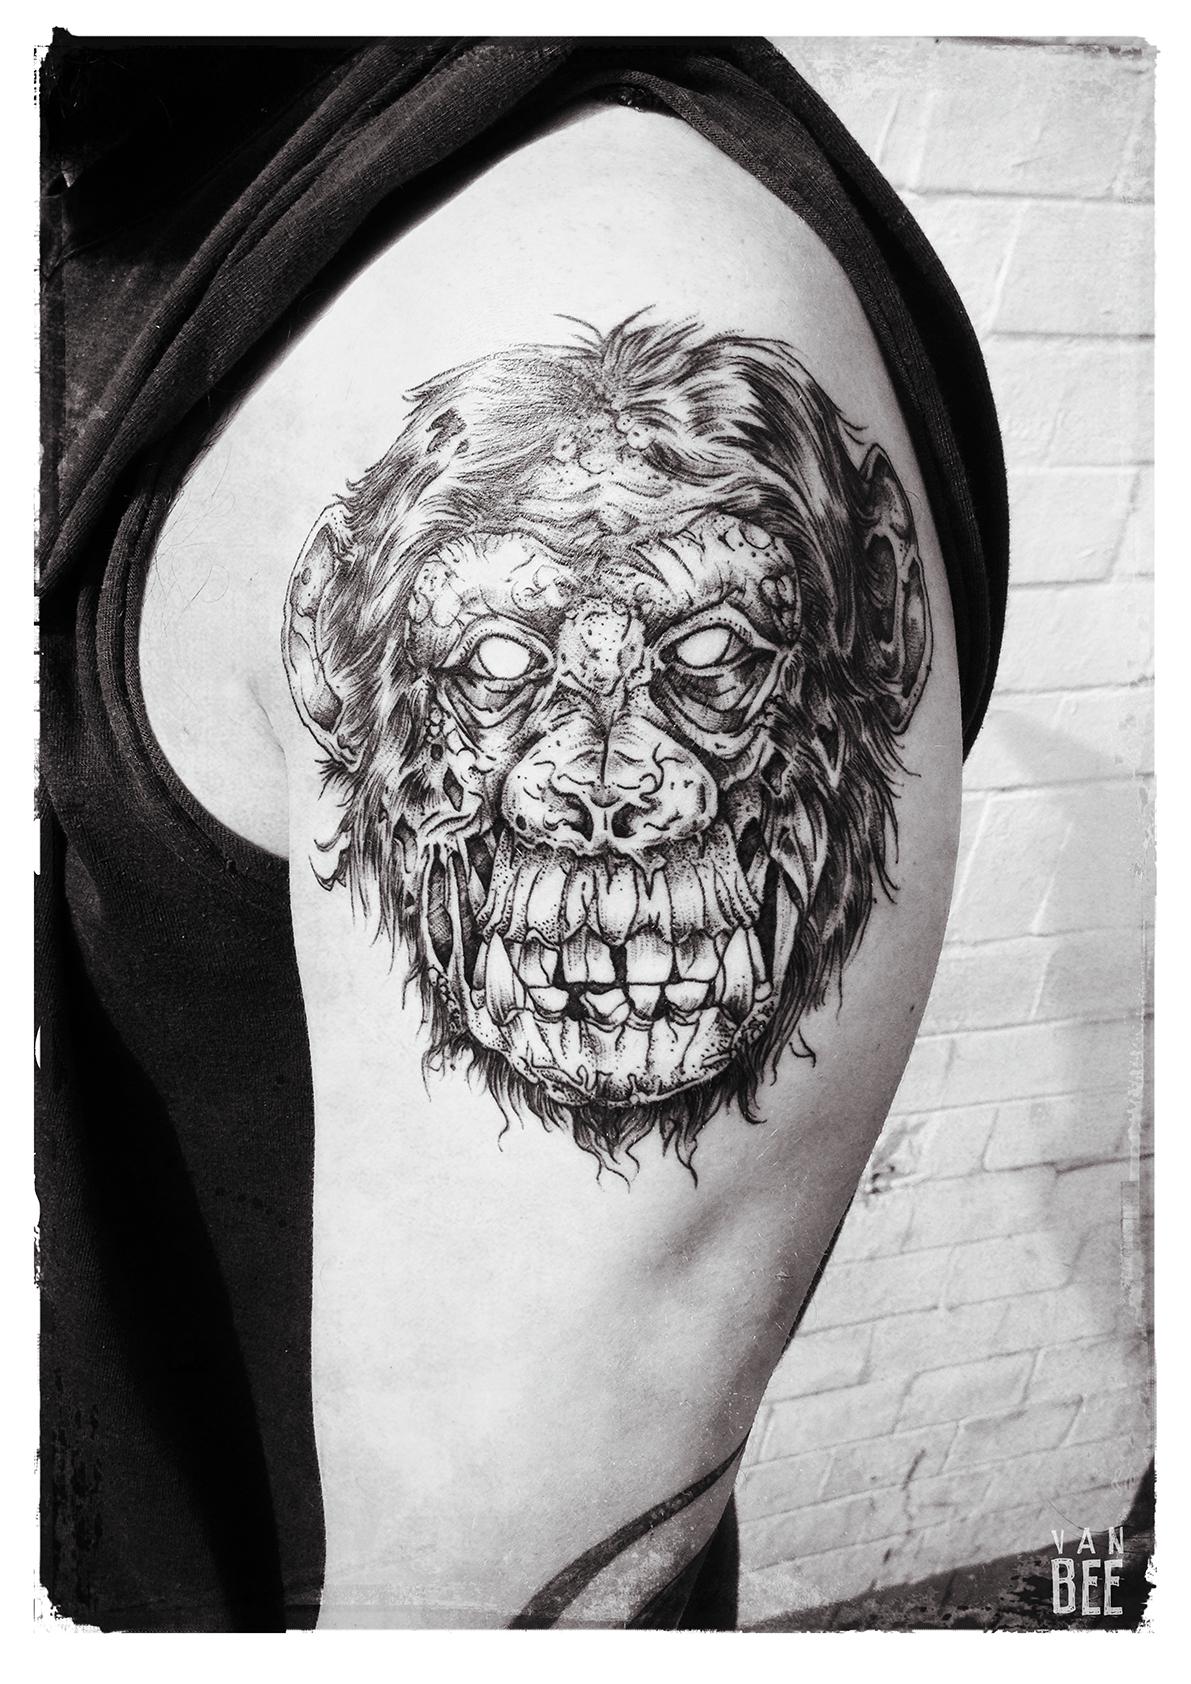 Van Bee, tattoo artist - the vandallist (1)